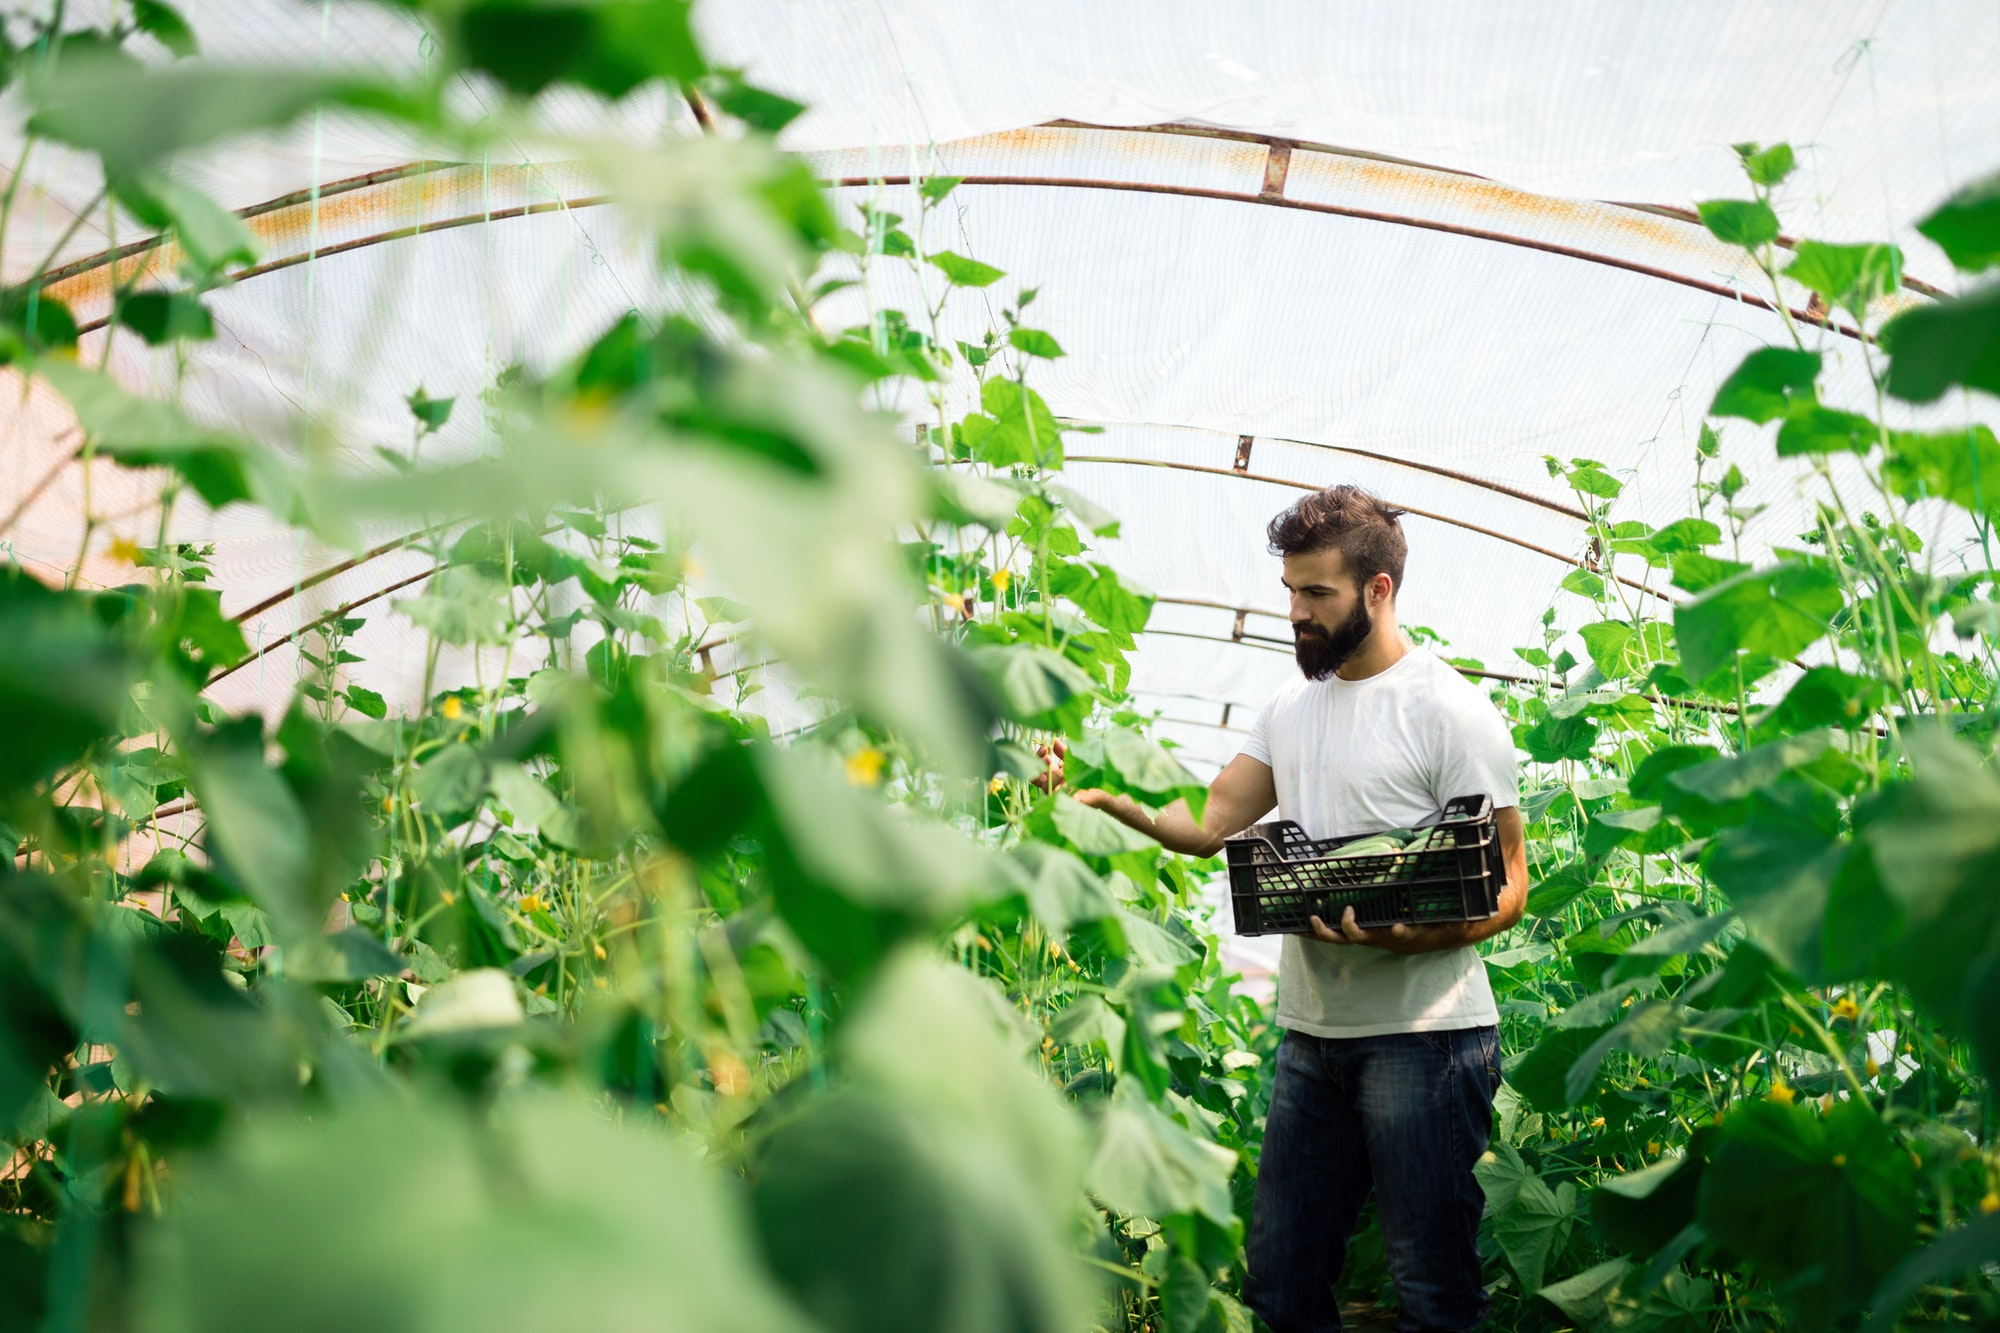 Farmer checking cucumber in a greenhouse